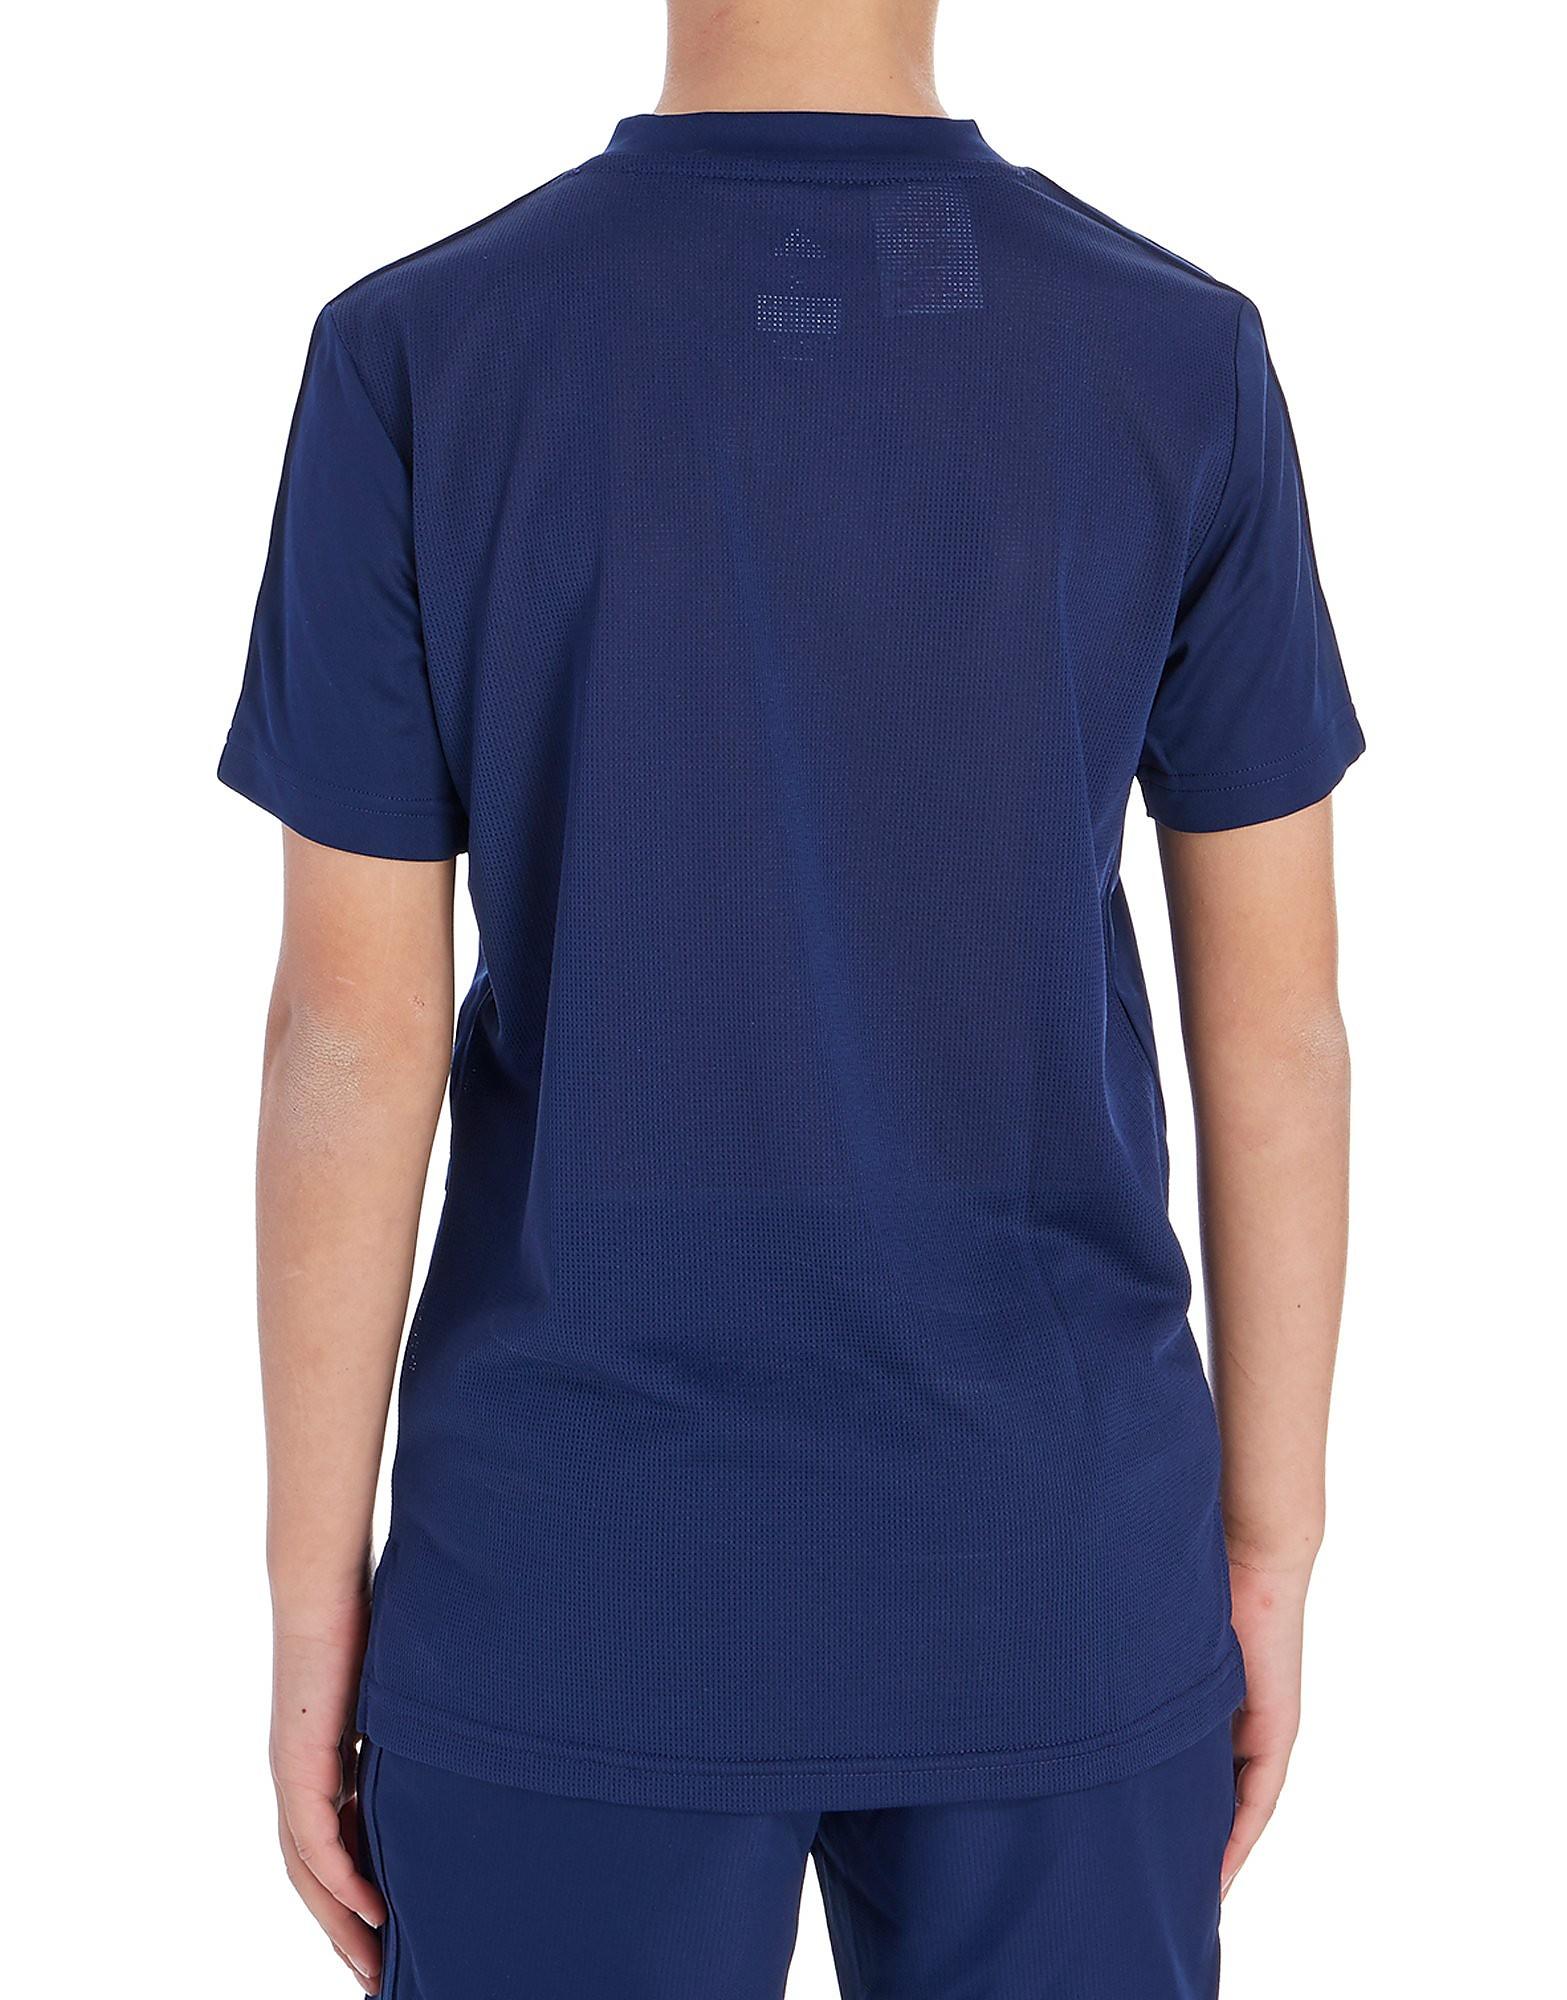 adidas Northern Ireland 2018 Training Shirt Junior